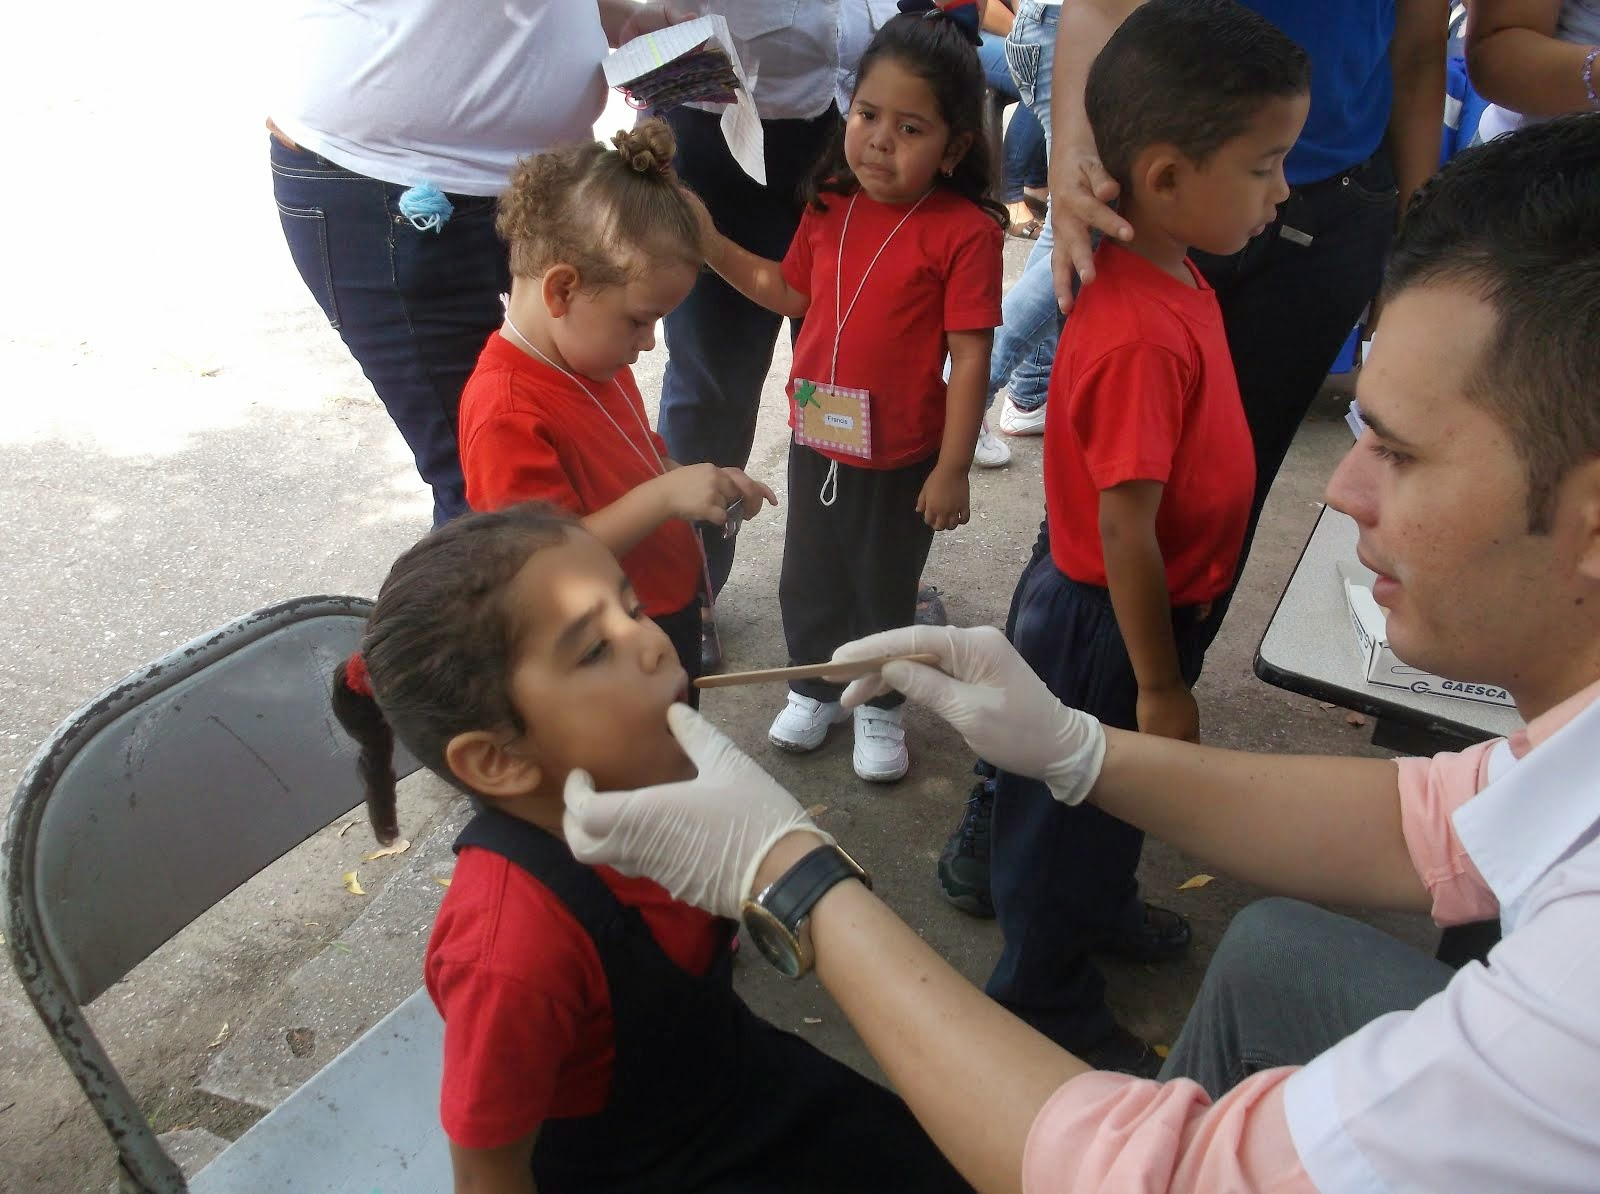 Odontologo Cubano Barrio Adentro Muy colaborador.